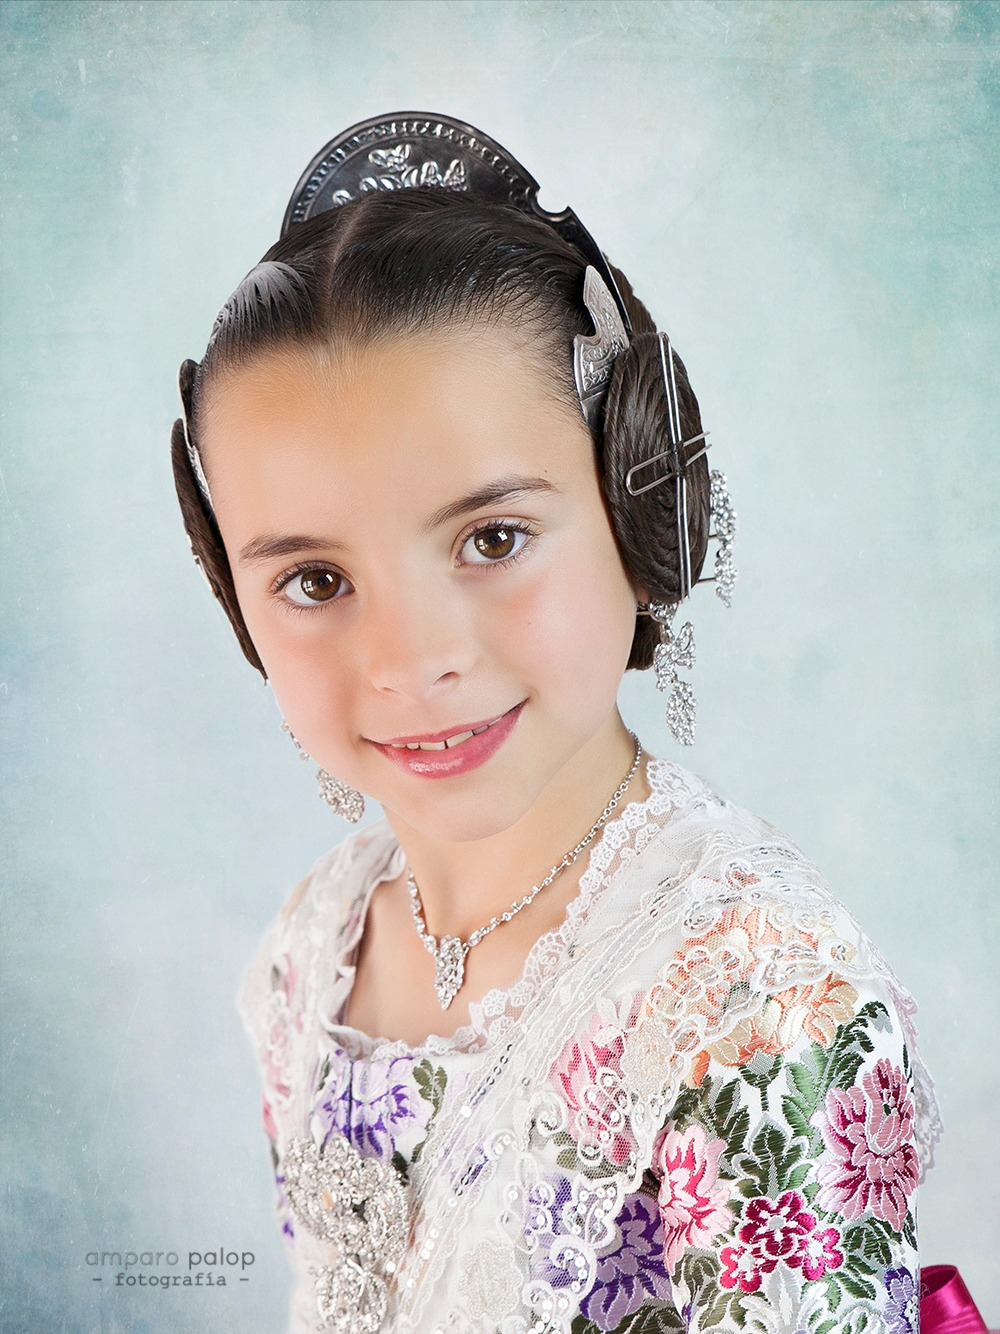 ELENA ARTAL PALOP- Fallera Mayor Infantil 2017